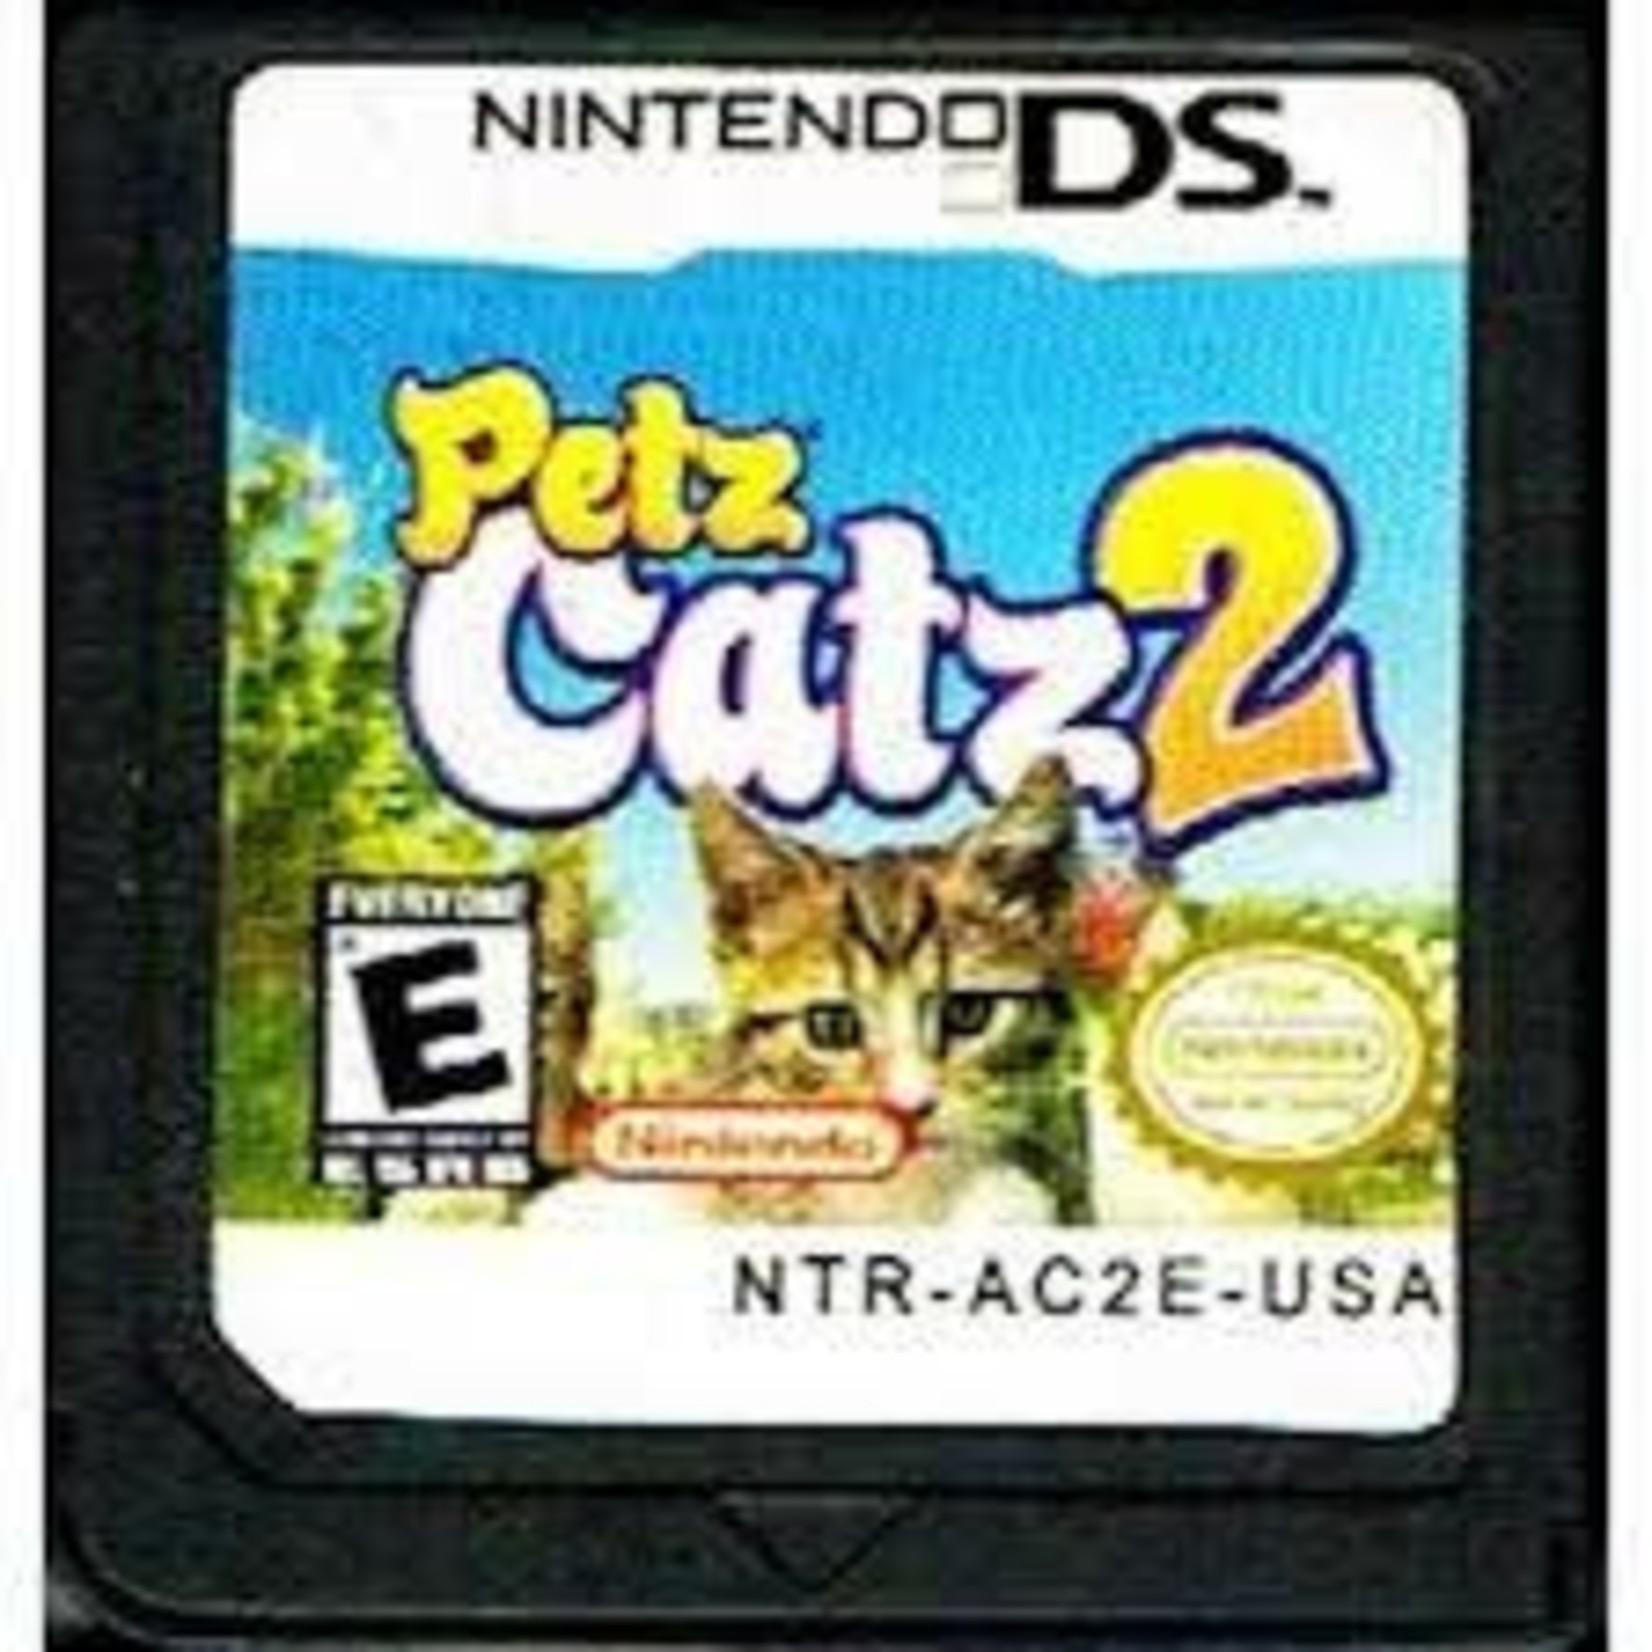 DSU-Petz Catz 2 (Chip Only)